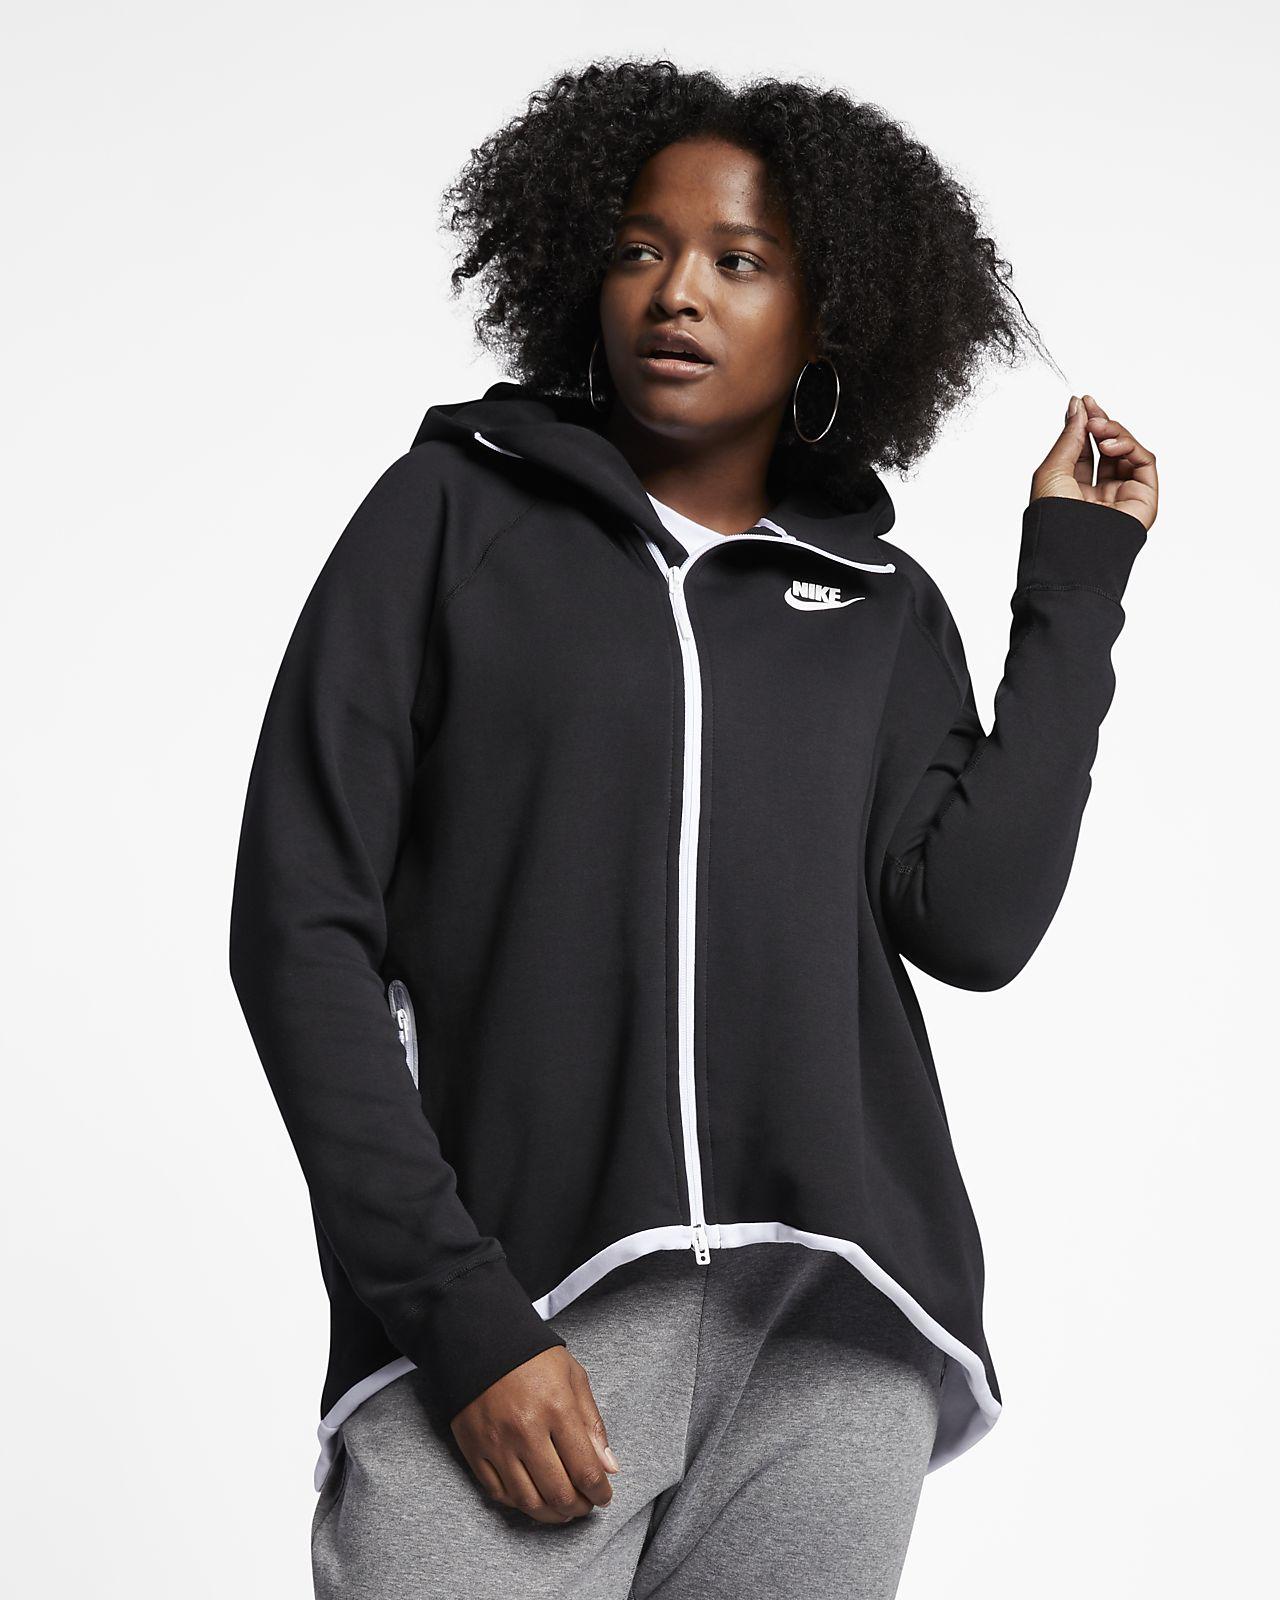 ... Nike Sportswear Tech Fleece hosszú cipzáras női pulóver (plus size  méret) 8a153cd12c